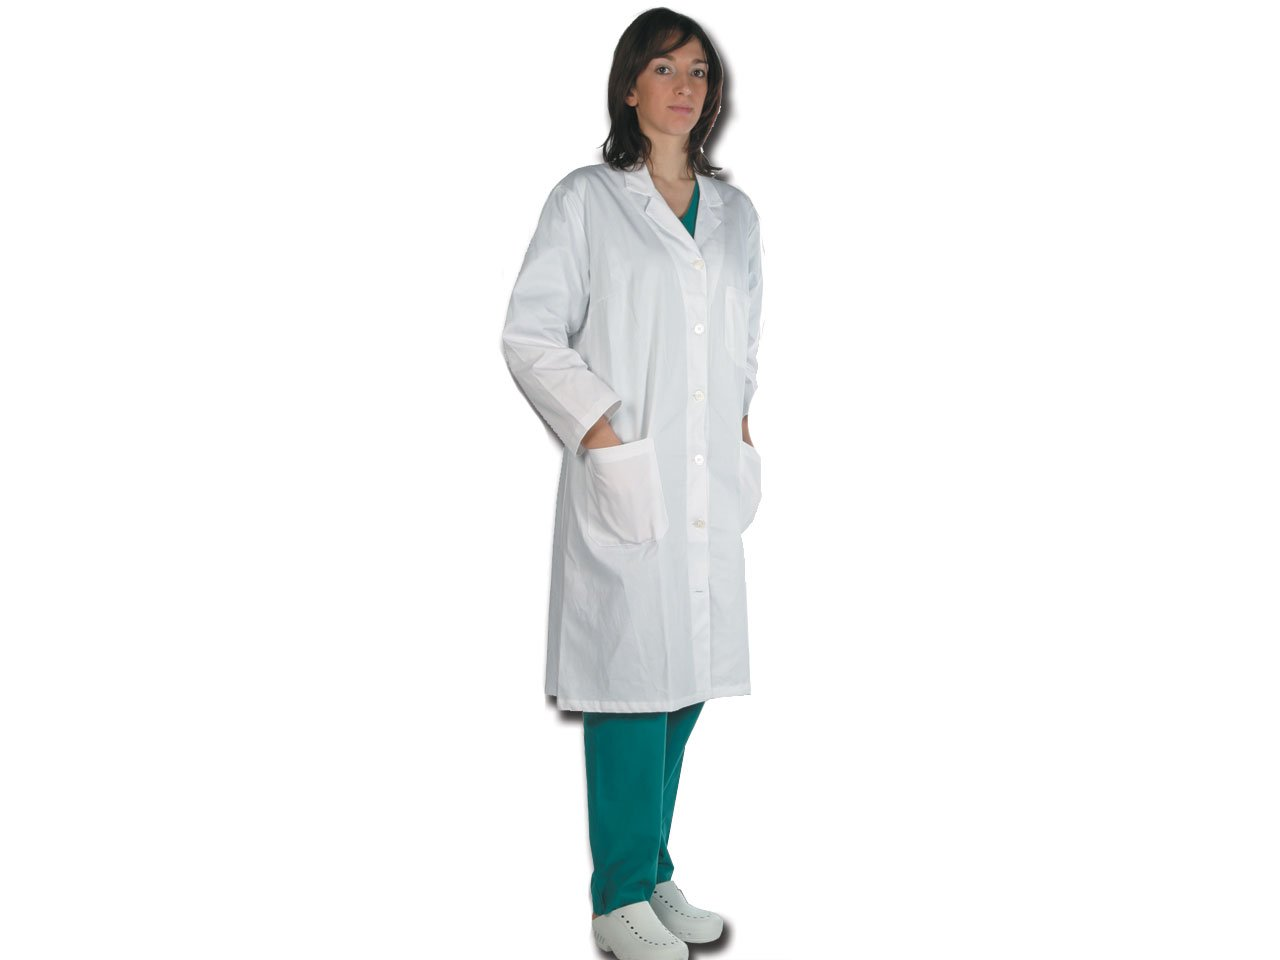 GiMa/ 1 Frauen Doctor Professional Coat /Wei/ß Lab wei/ß Baumwolle//Polyester XS